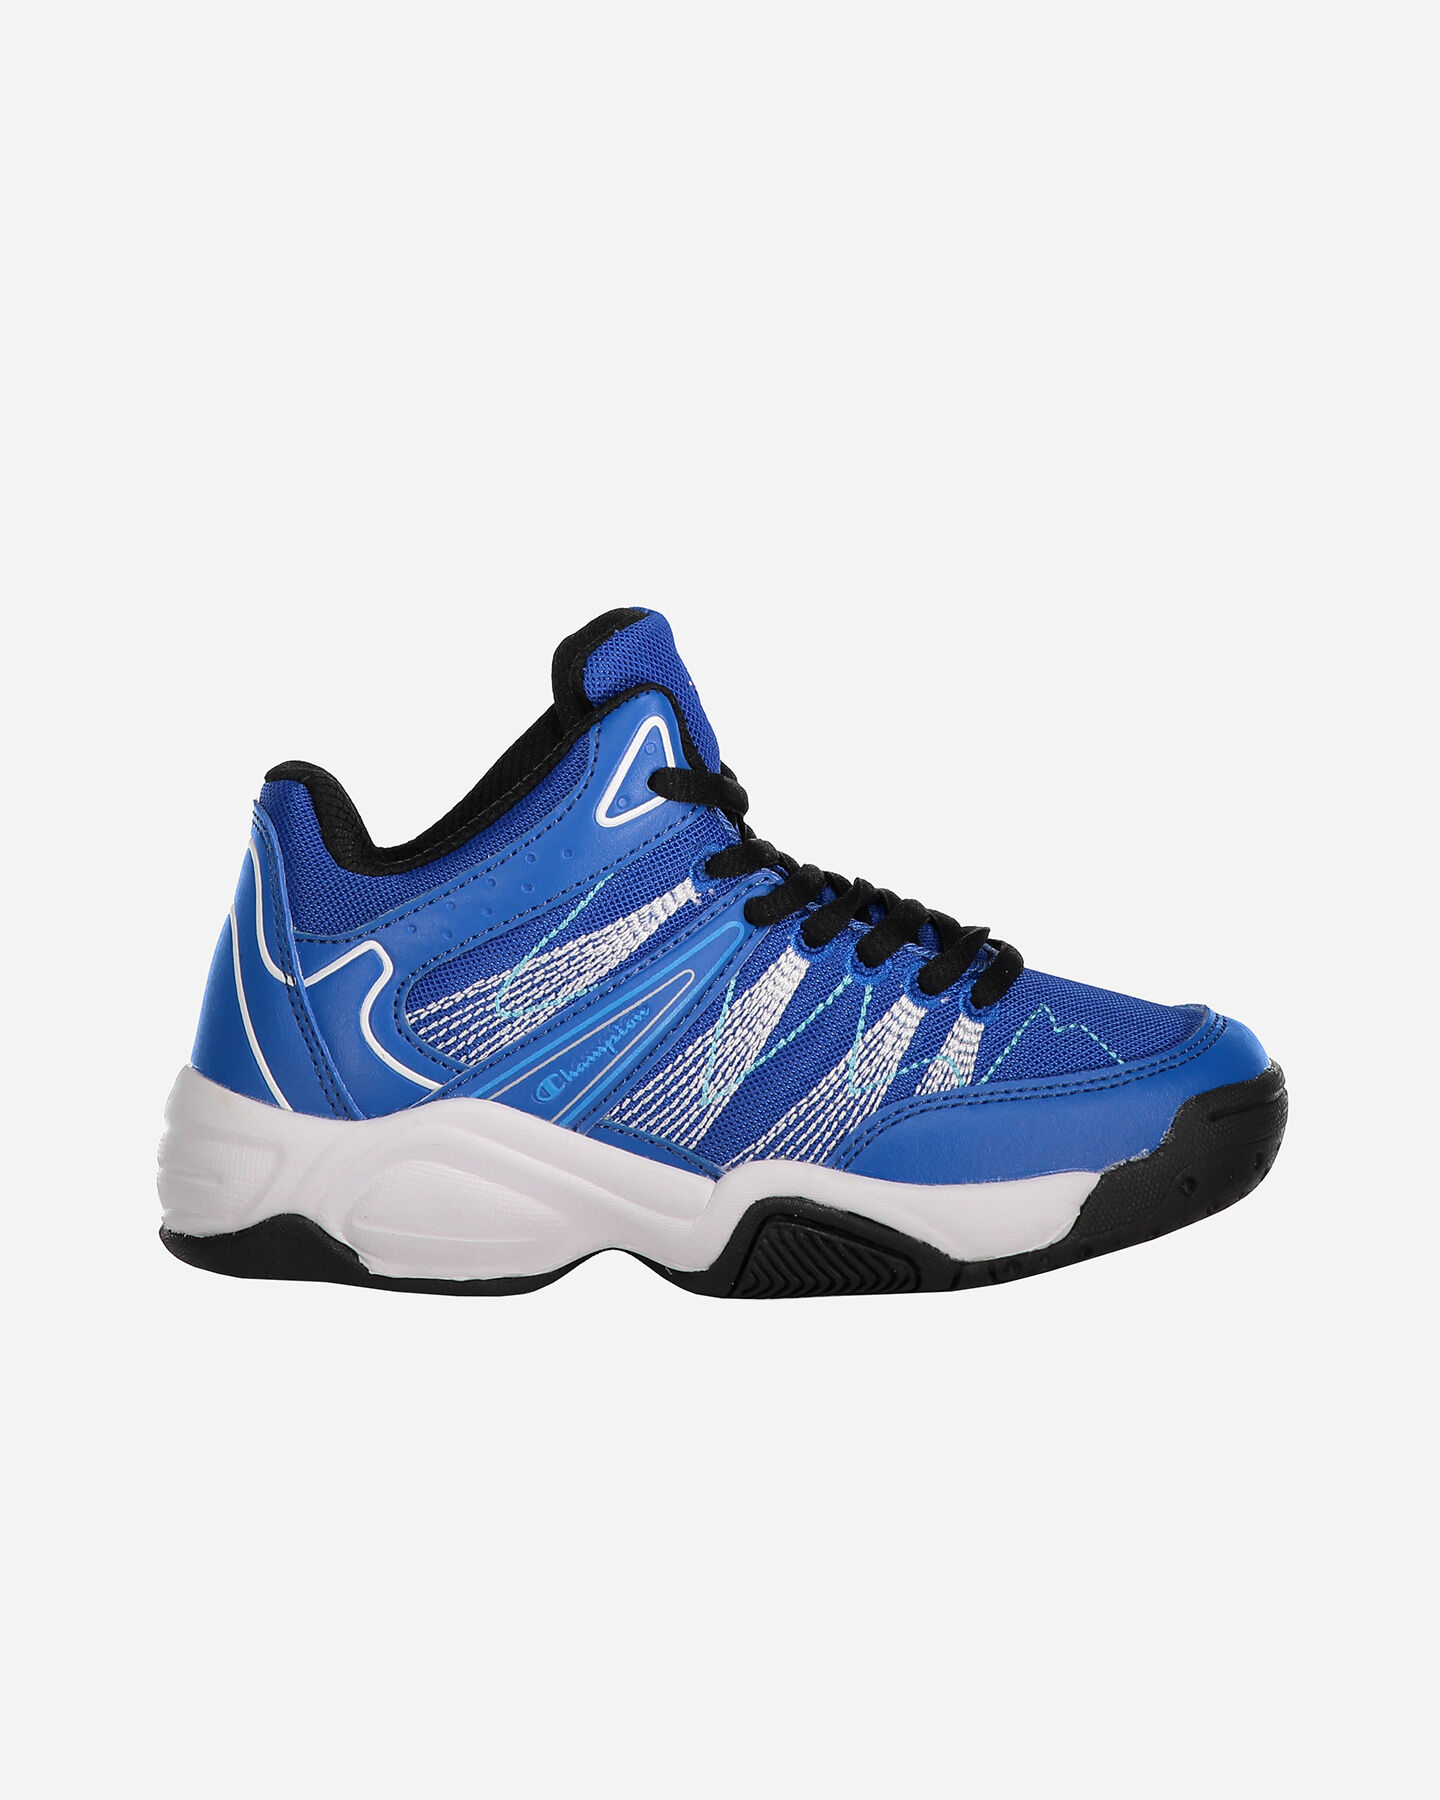 scarpe ginnastica bimba 31 adidas